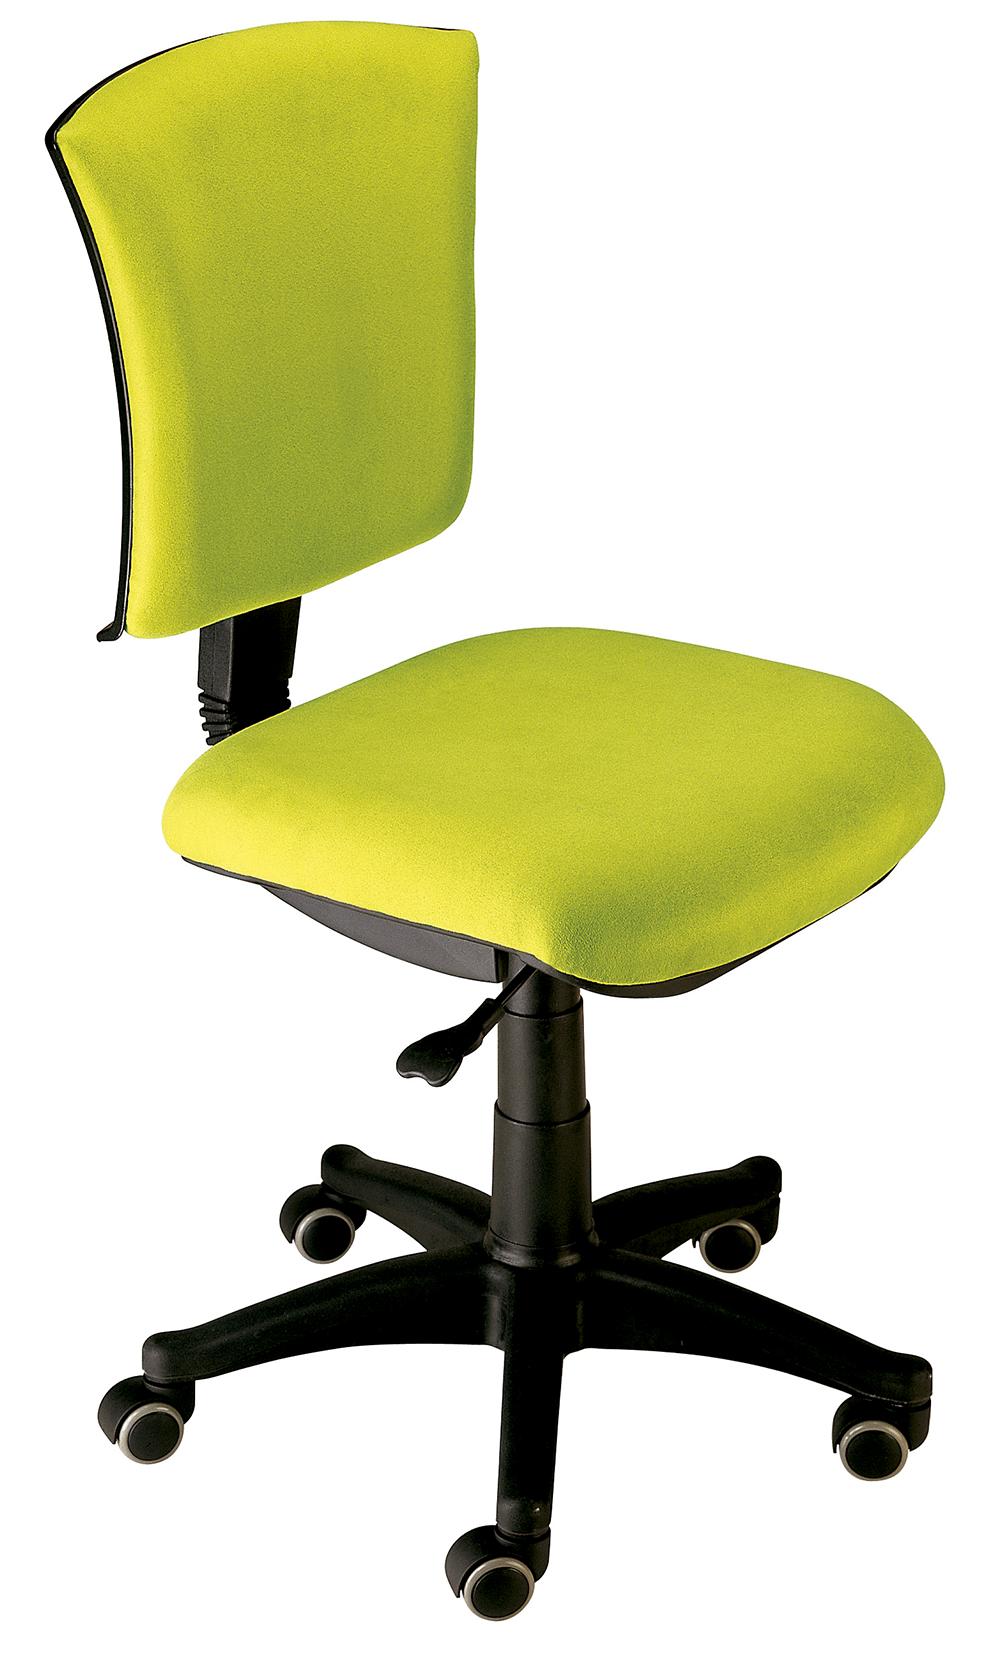 Silla estudio barata for Estudio sillas